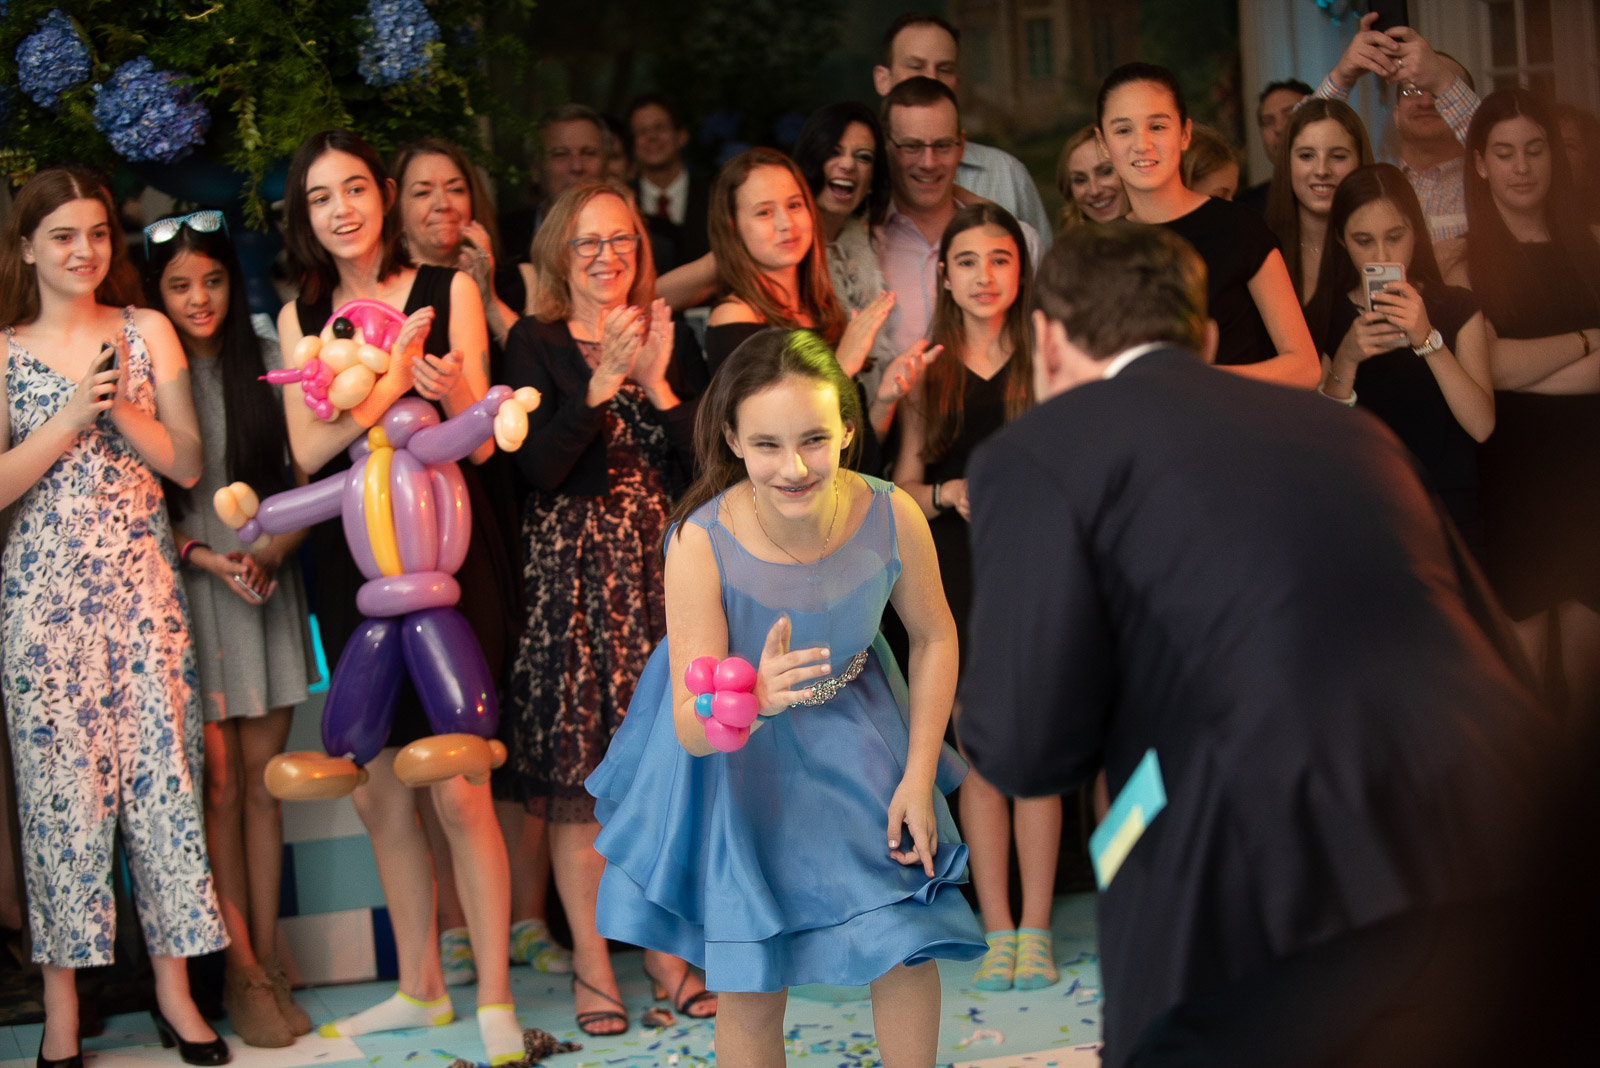 Bat mitzvah hora dancing